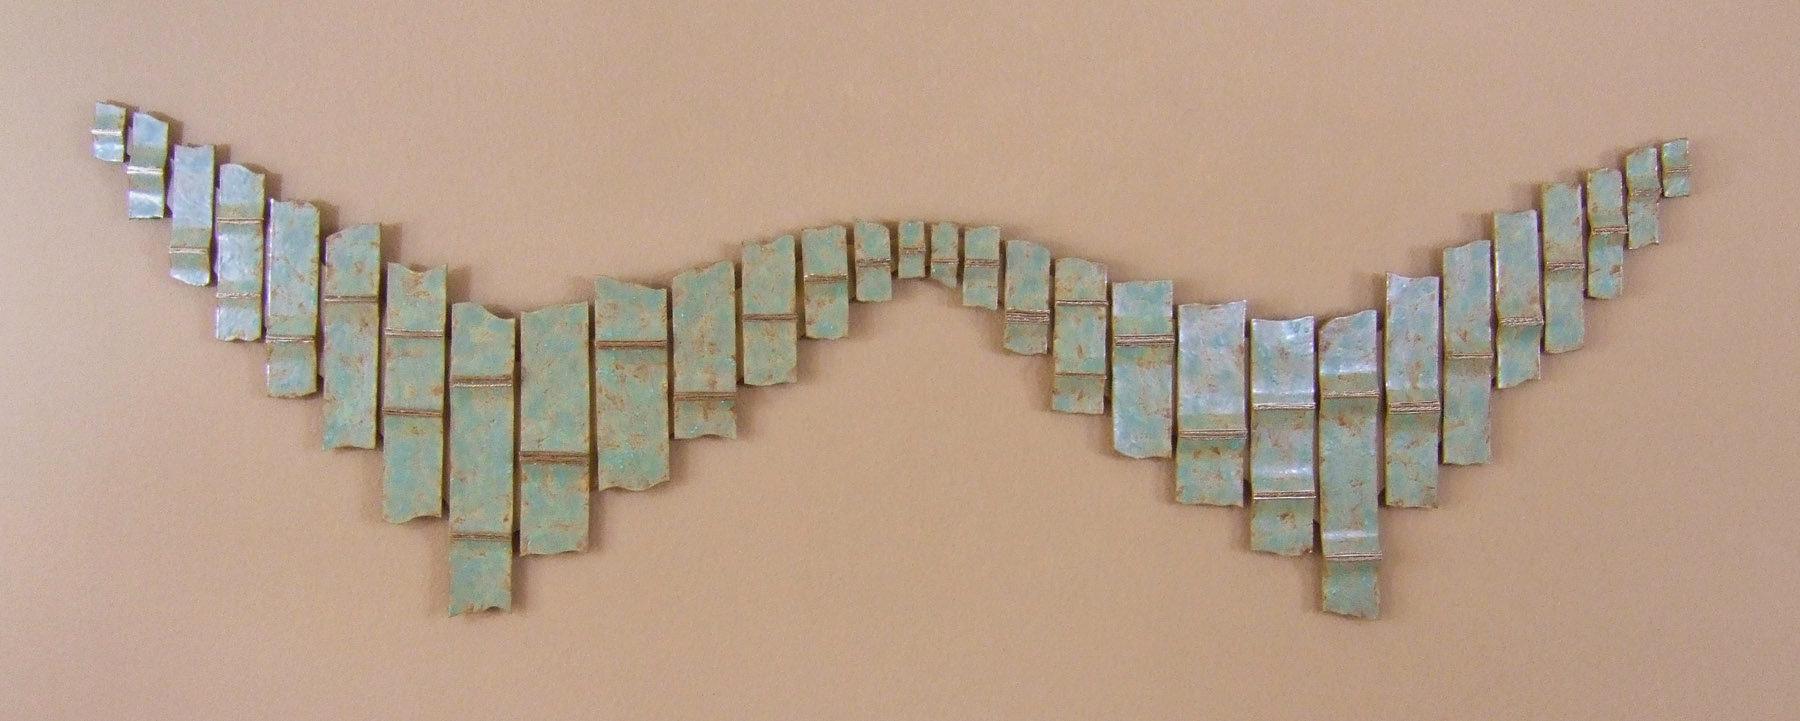 Ceramic wall art for Ceramic wall art